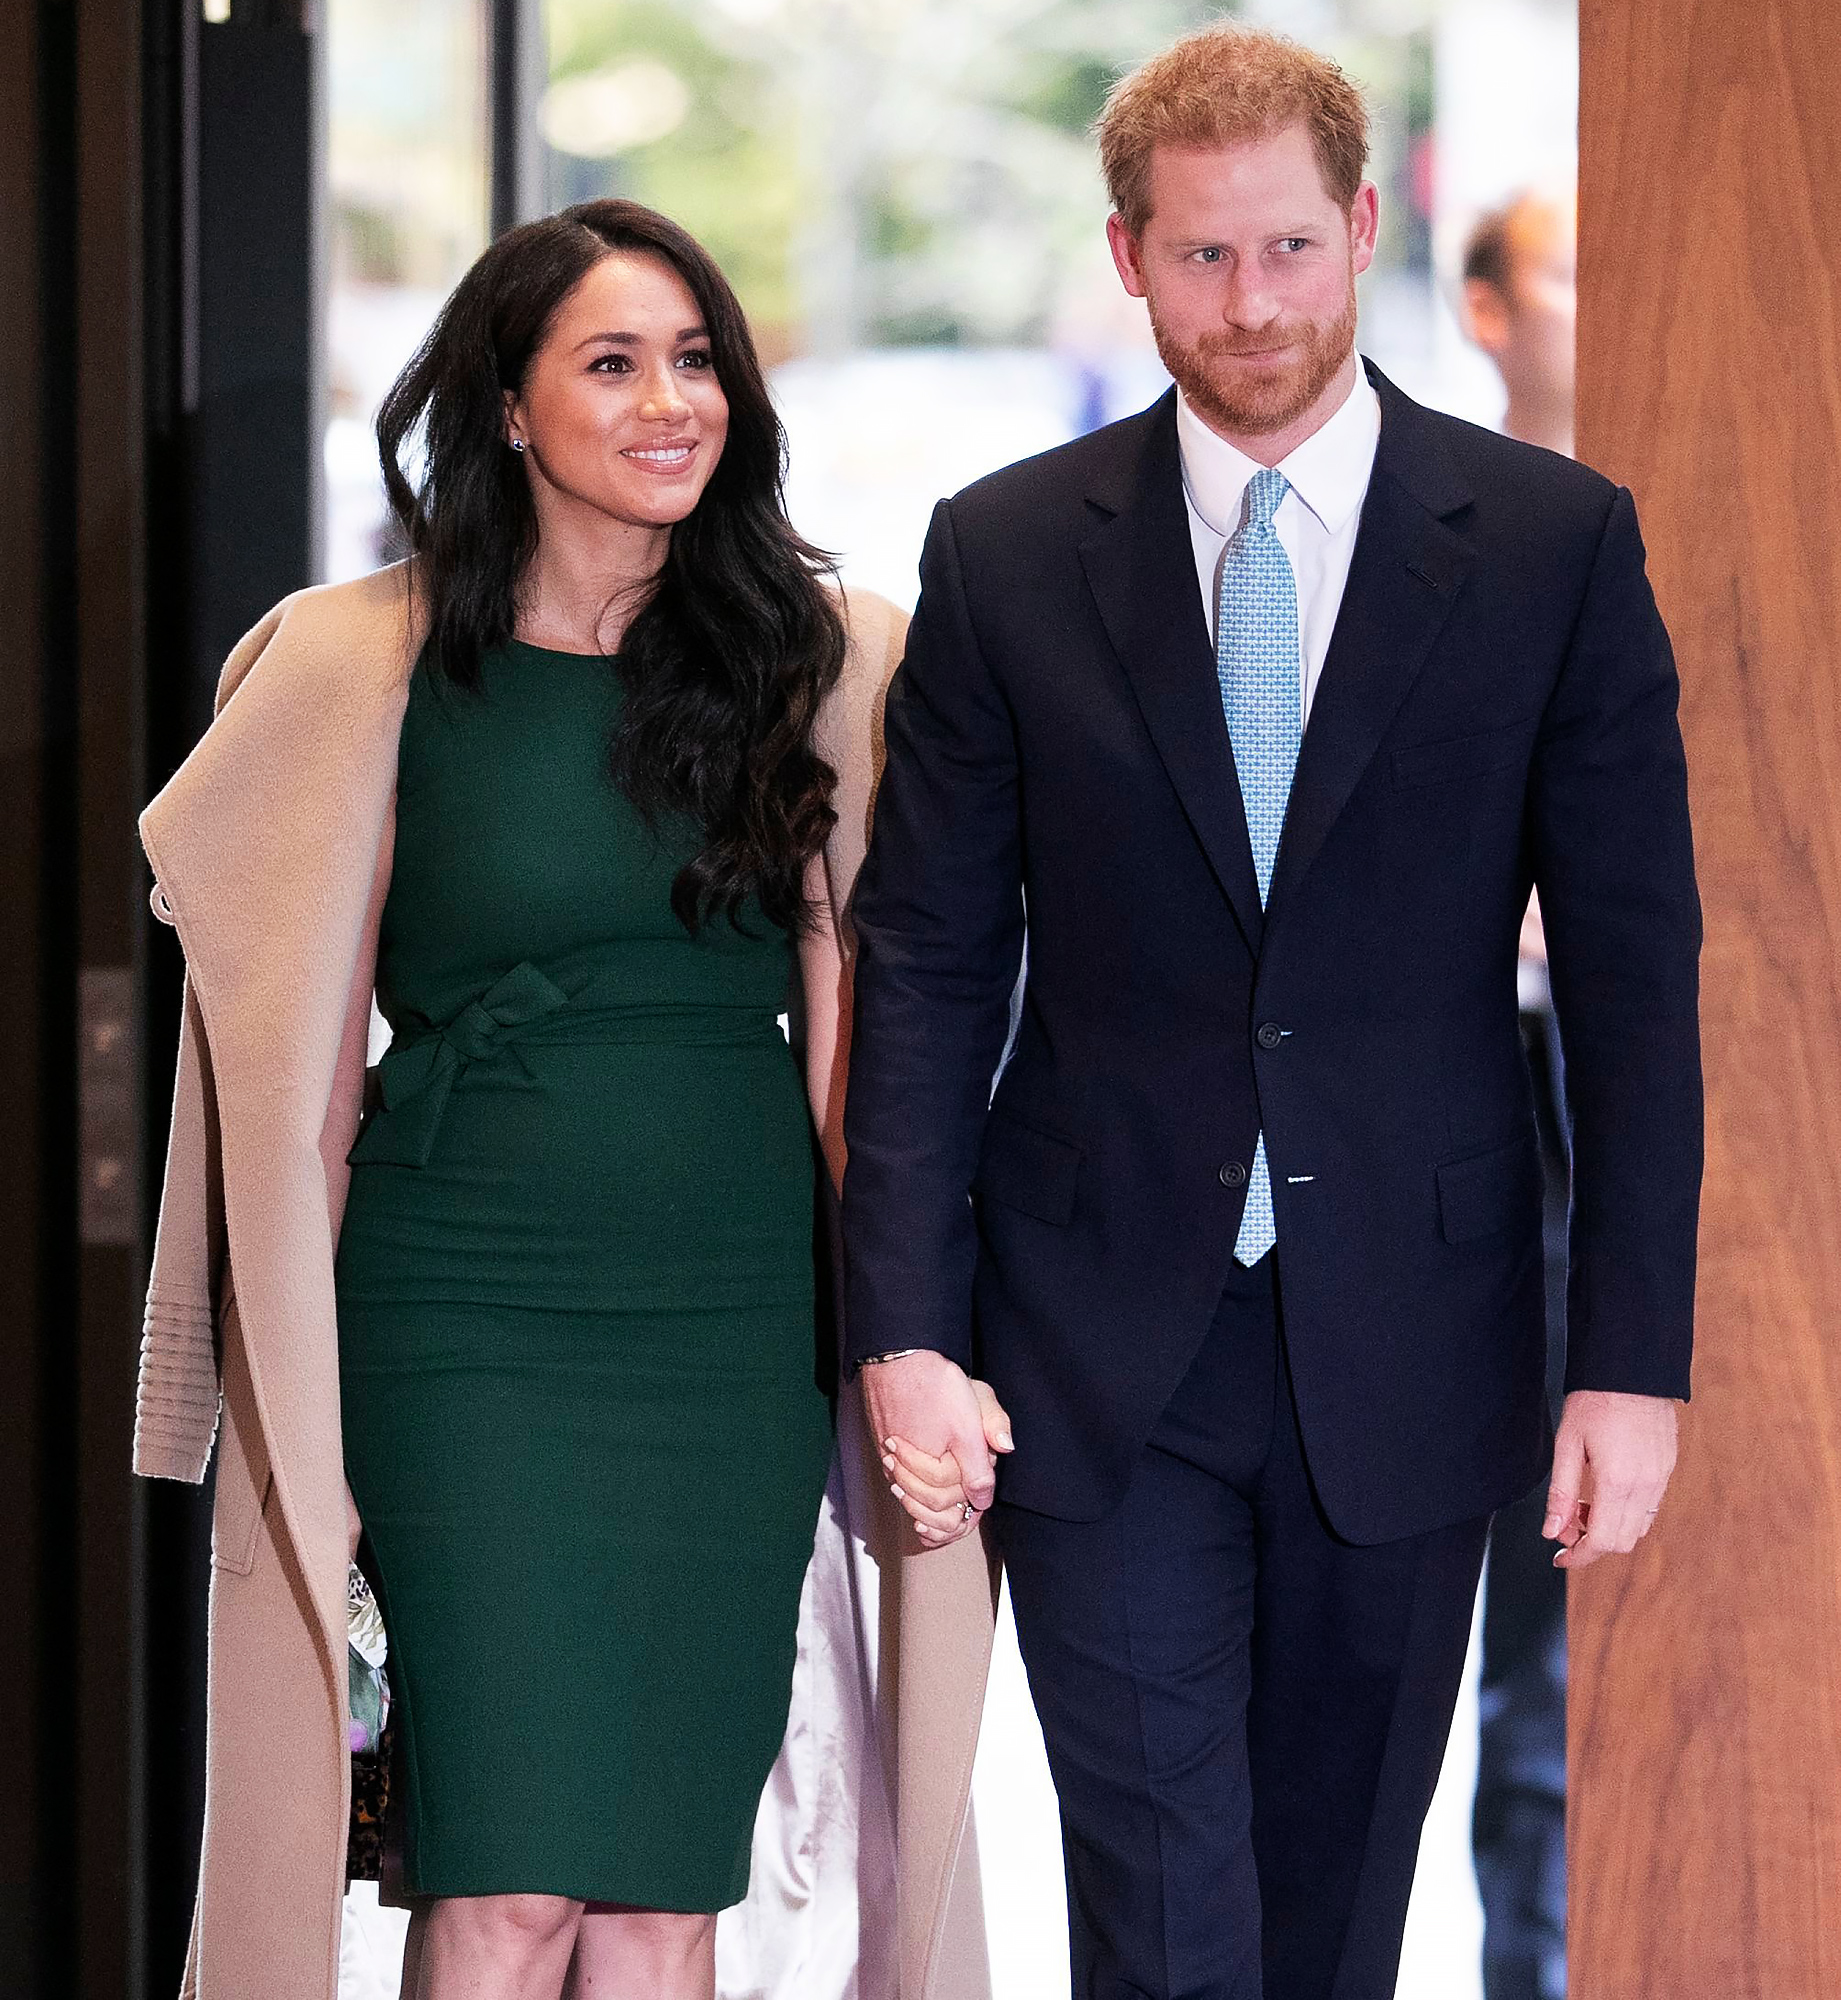 Prince Harry, Meghan Markle Rebrand on Hold Amid Pandemic